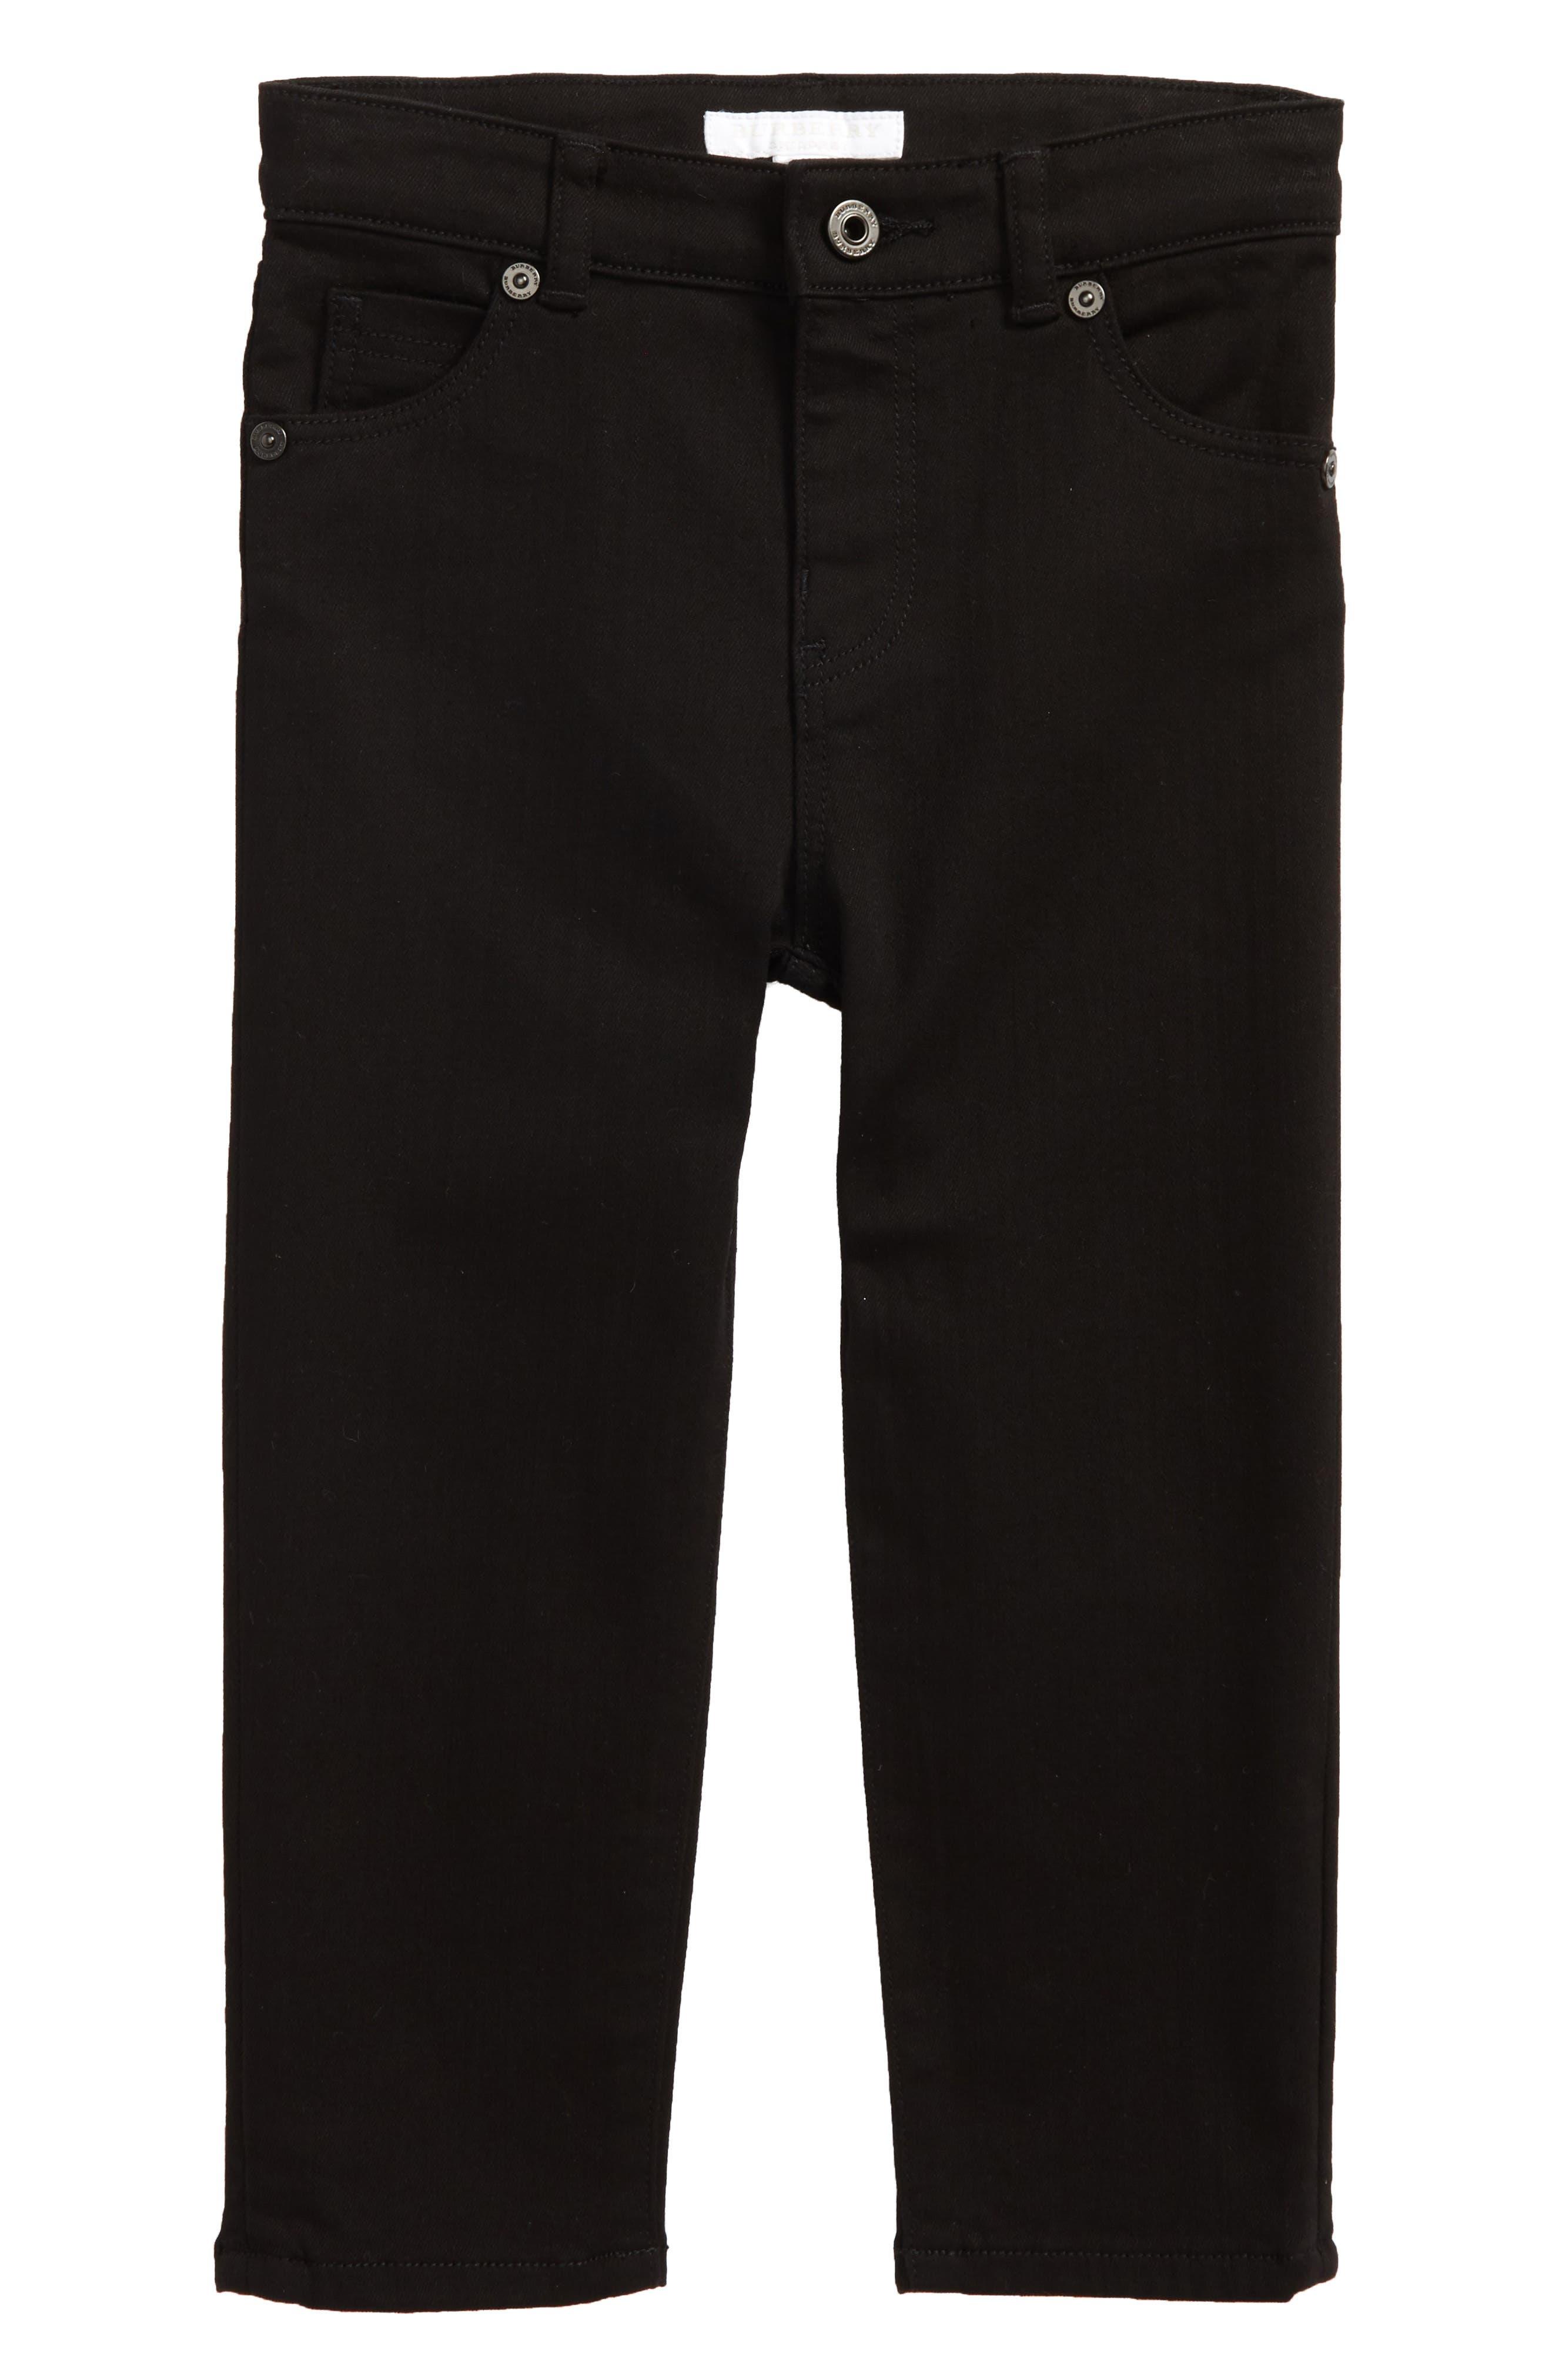 BURBERRY Skinny Jeans, Main, color, BLACK